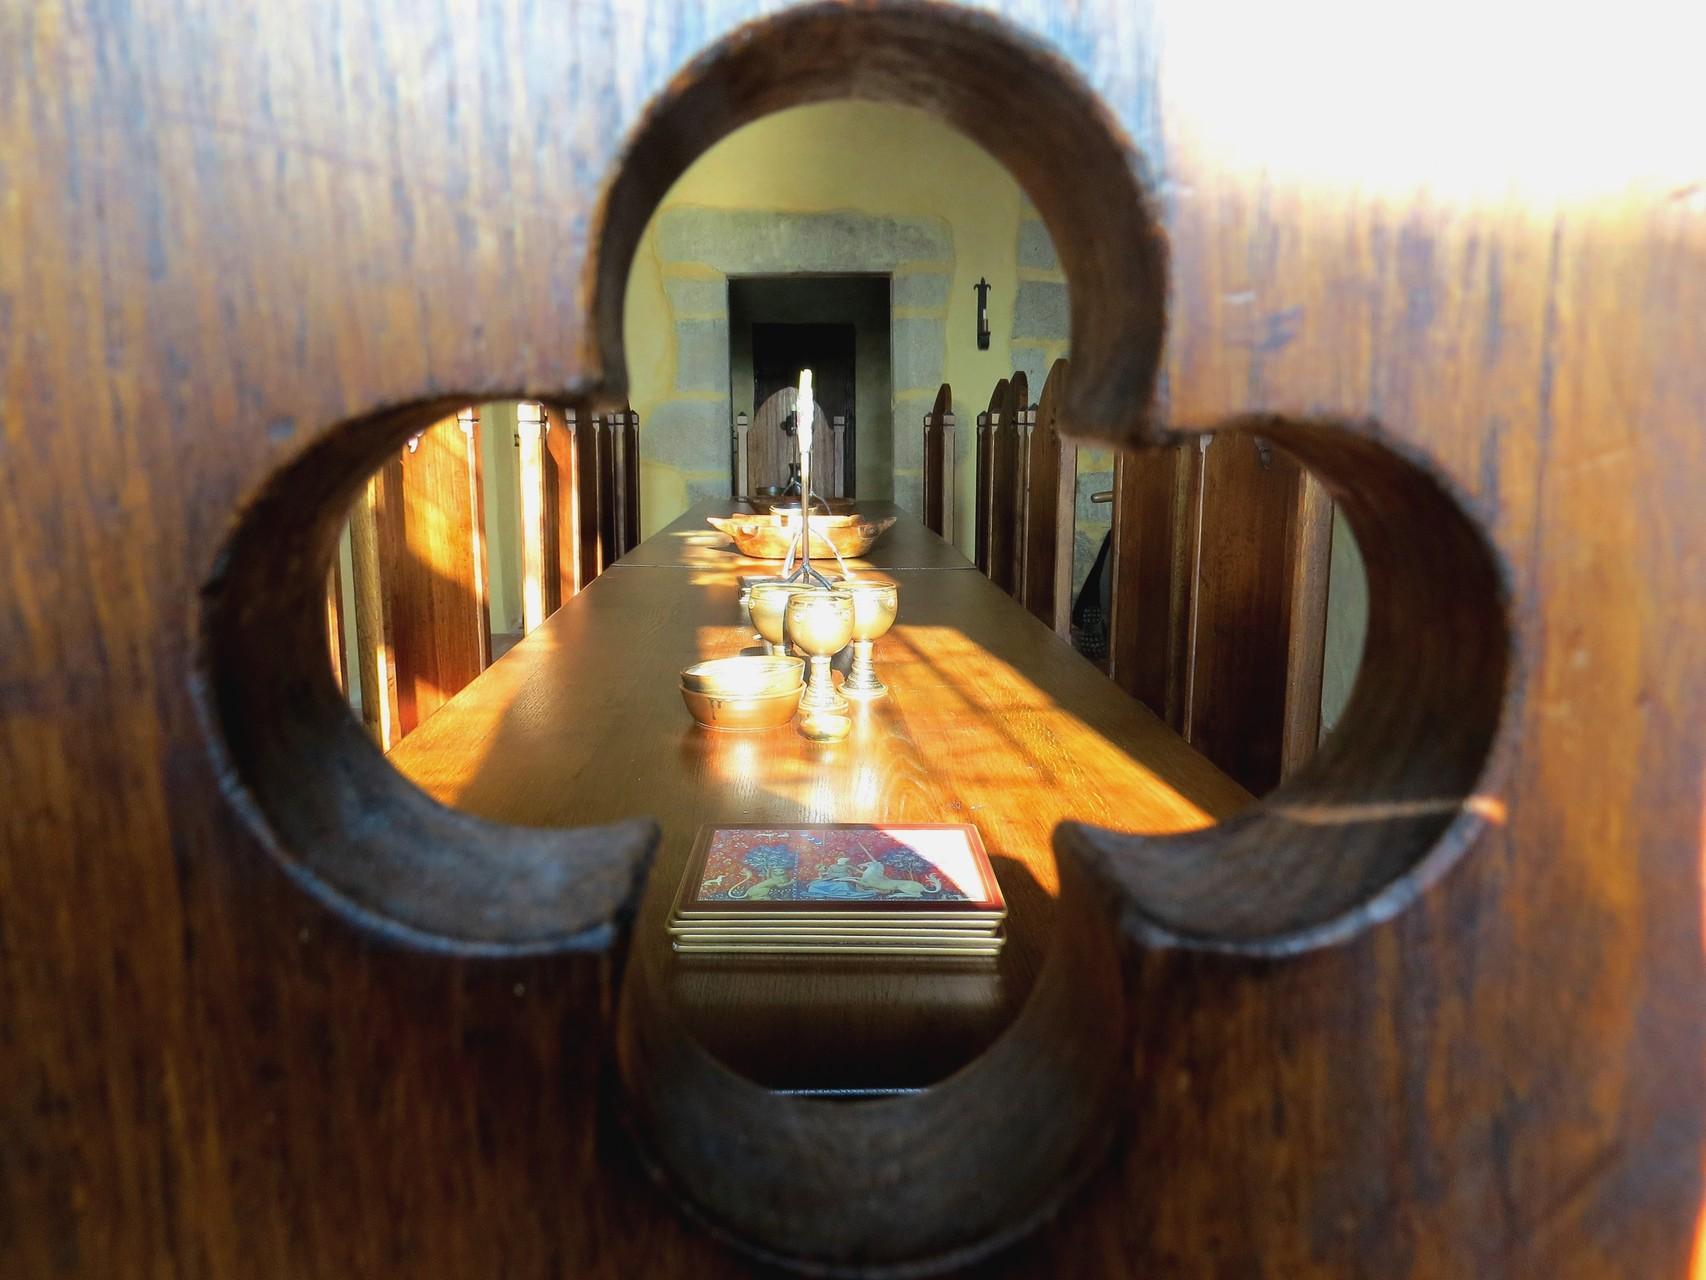 Salla à manger chambres d'hotes forteresse de Tennessus